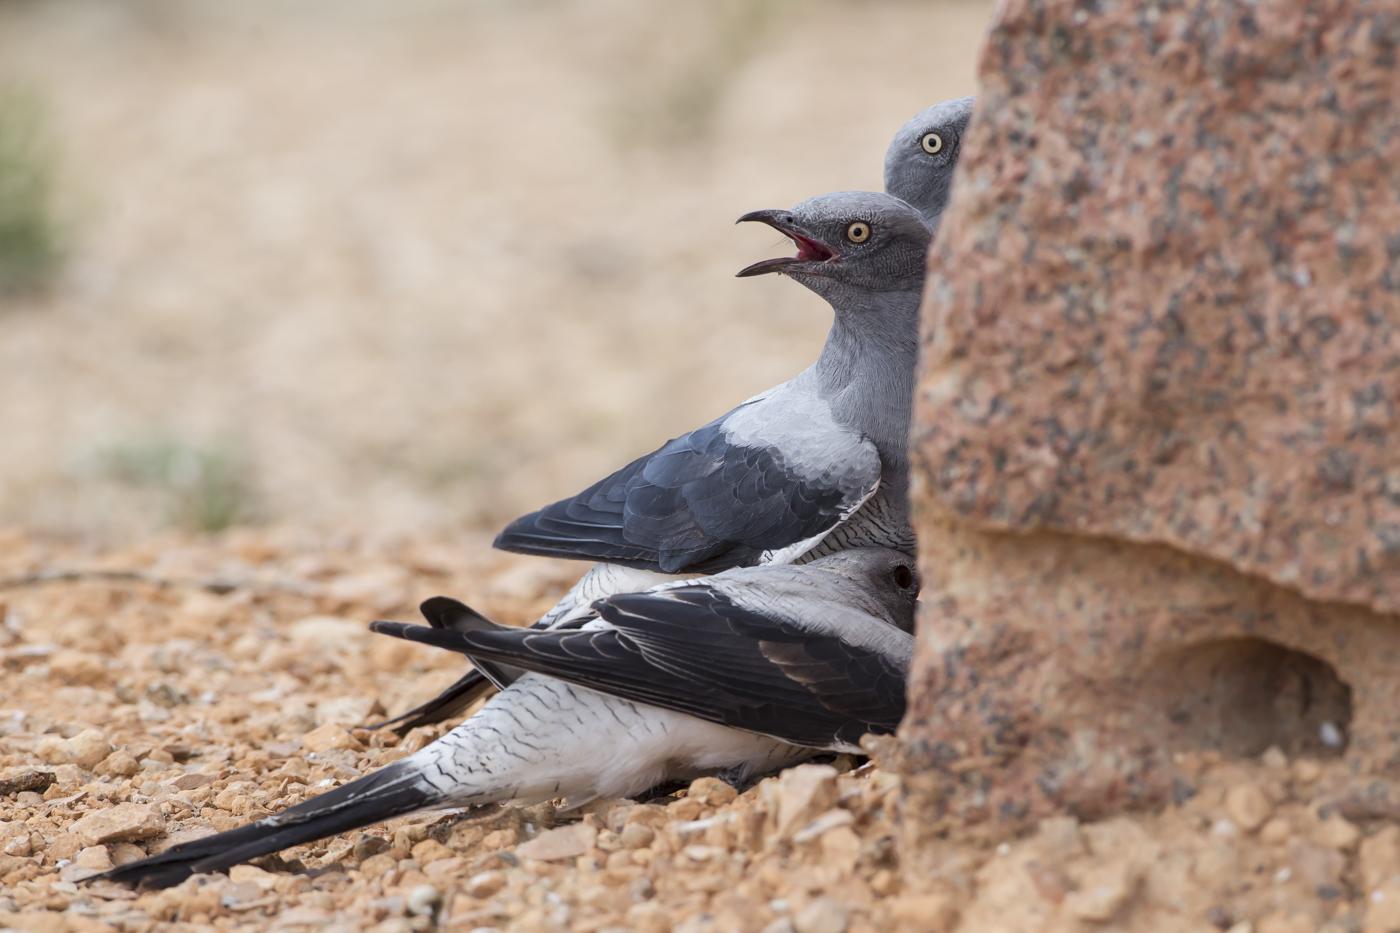 ground-cuckoo-shrike-yantanabie-school-south-austalia